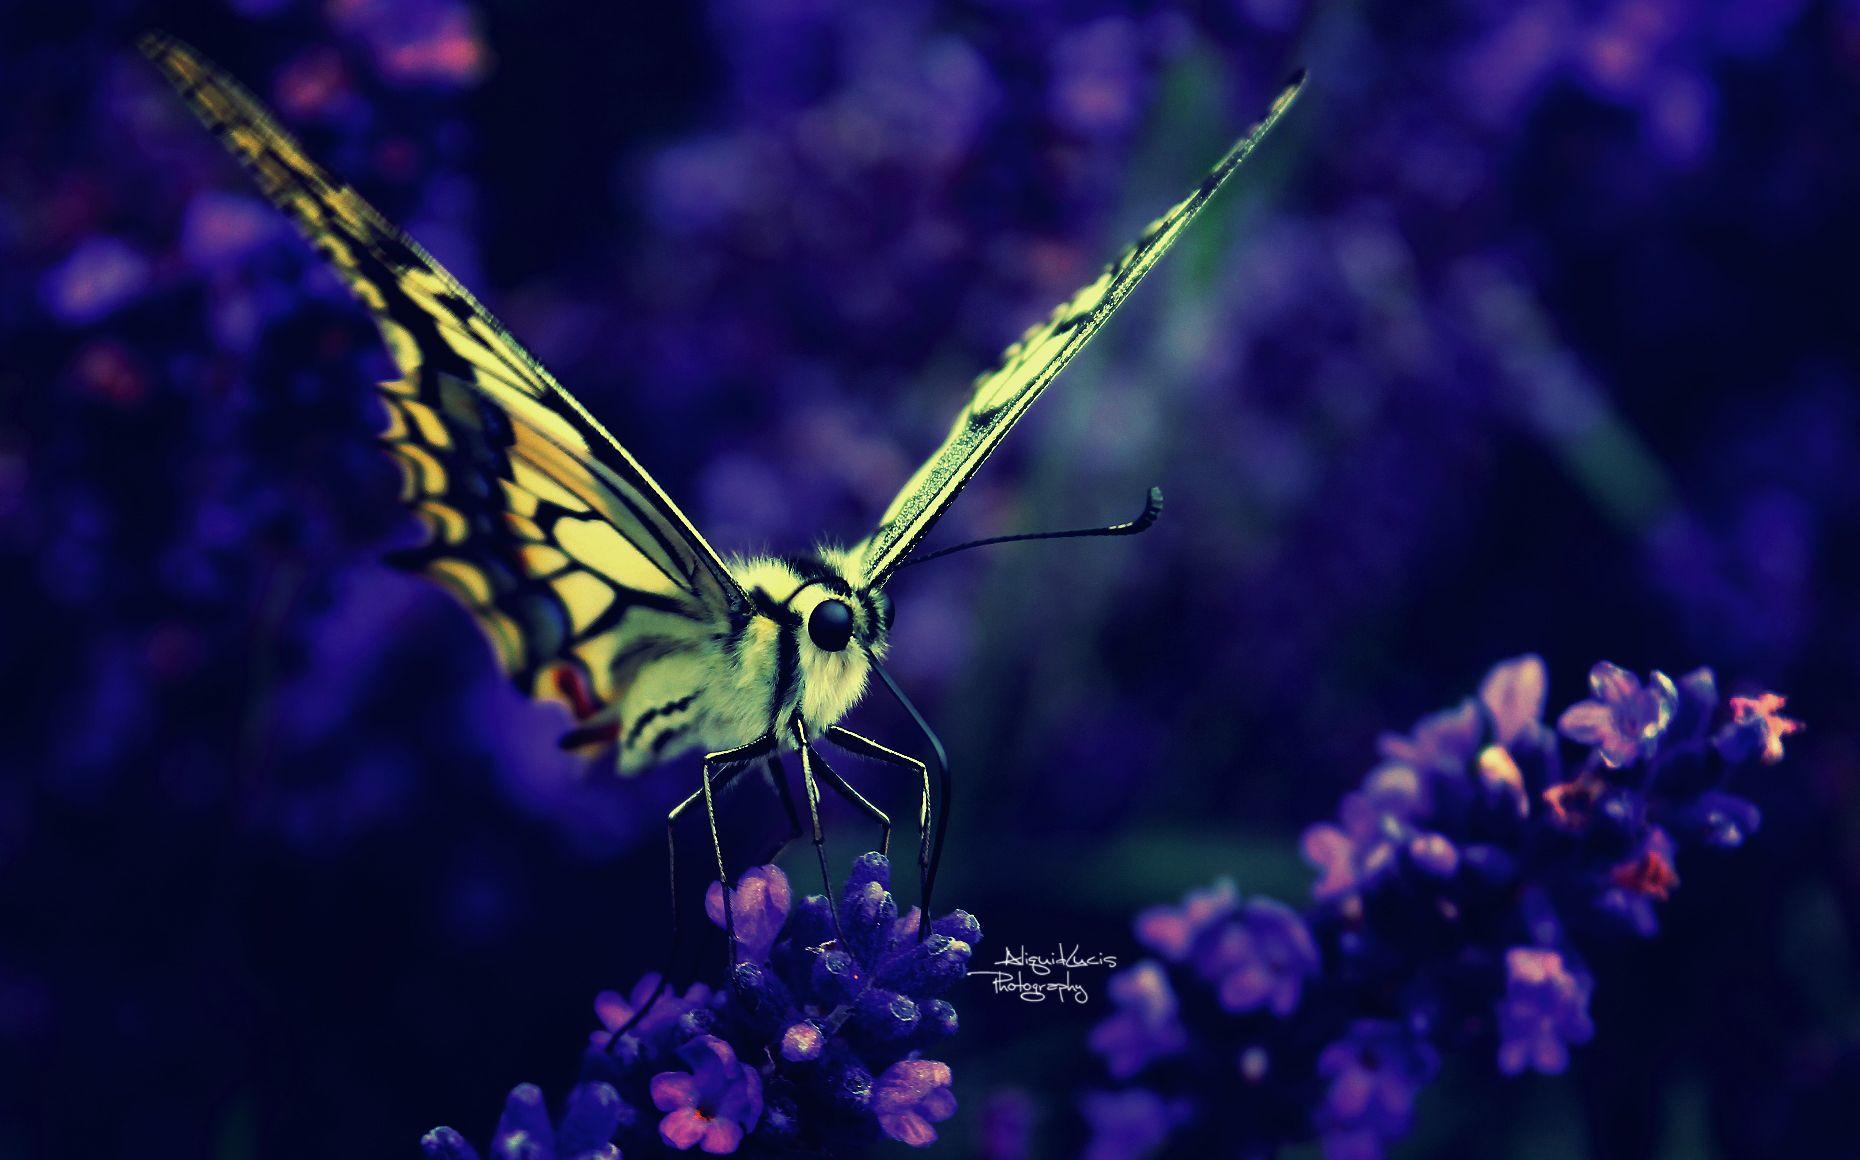 Delicate Beauty by AliquidLucis